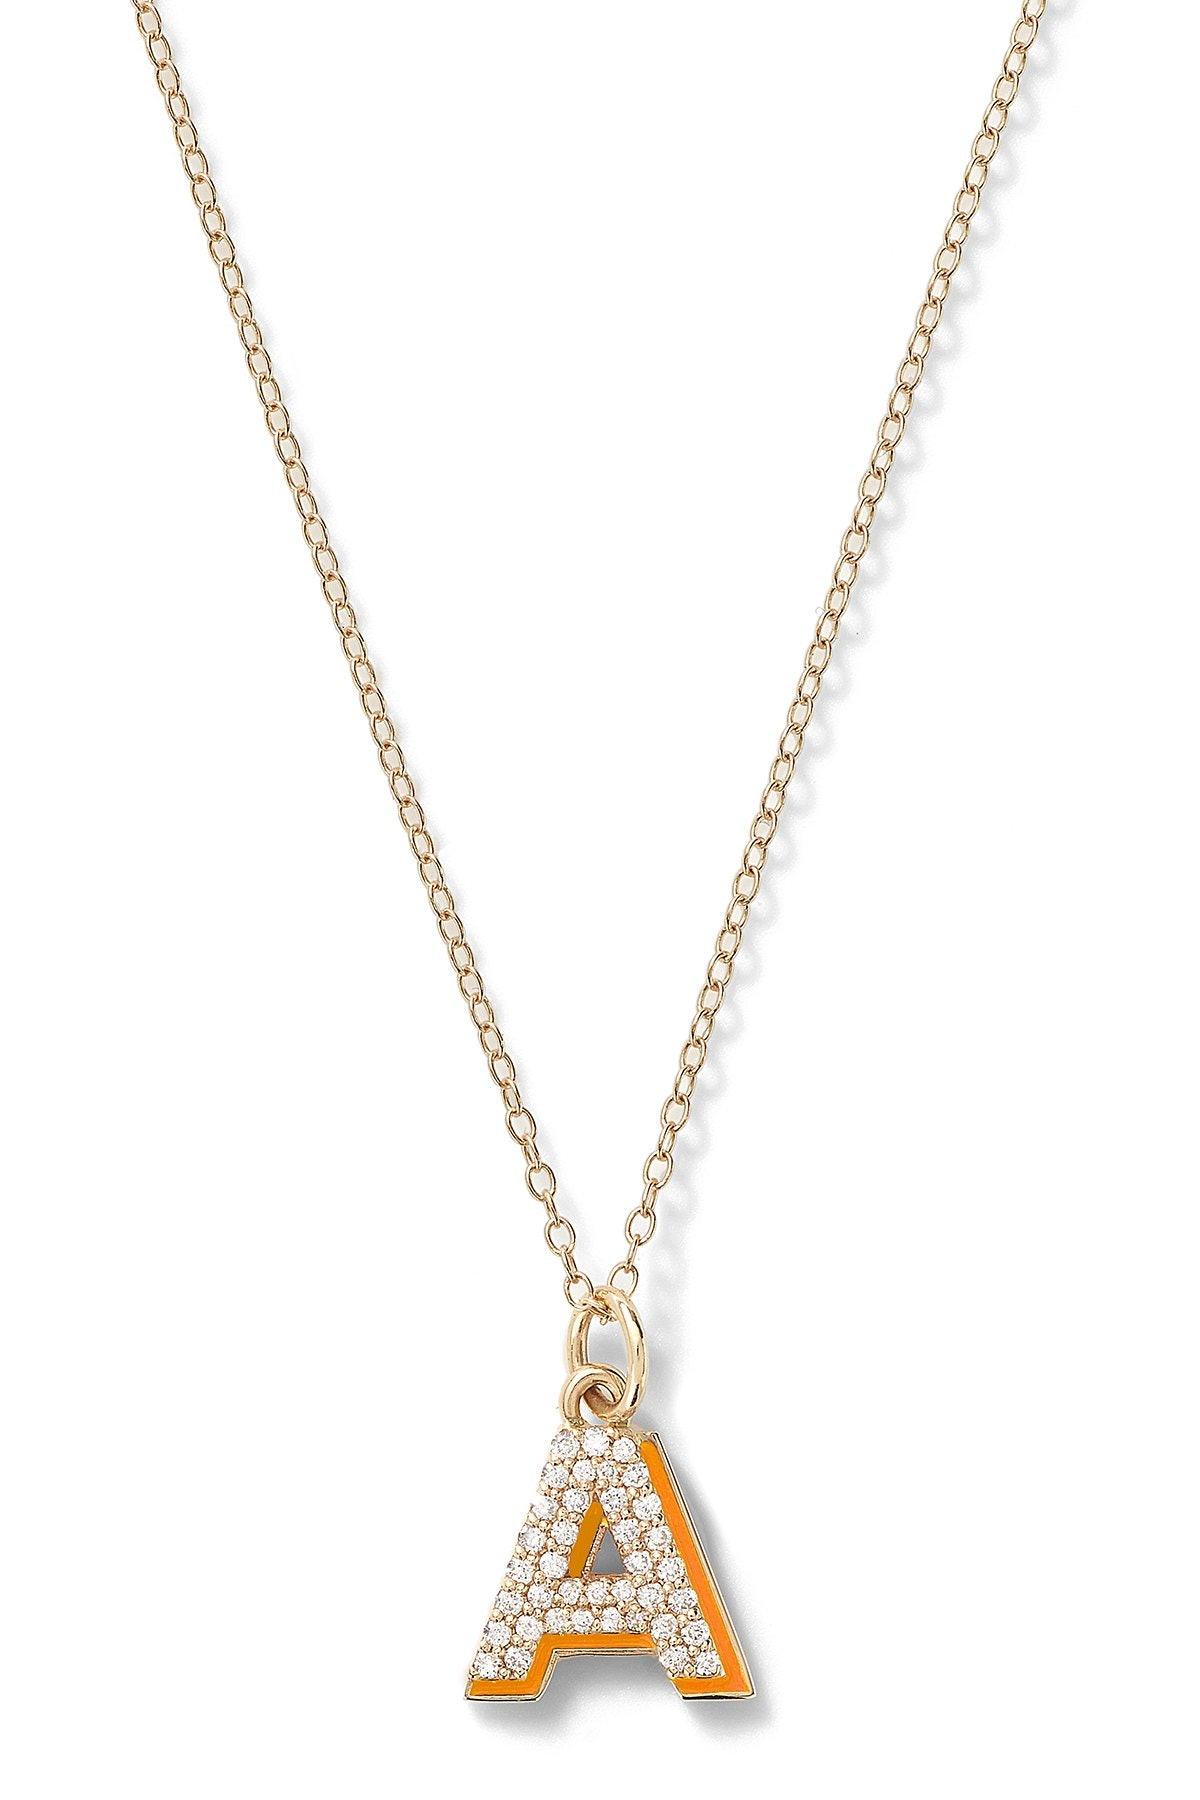 14K Yellow Gold Mini Diamond Letter with Enamel Shadow Necklace